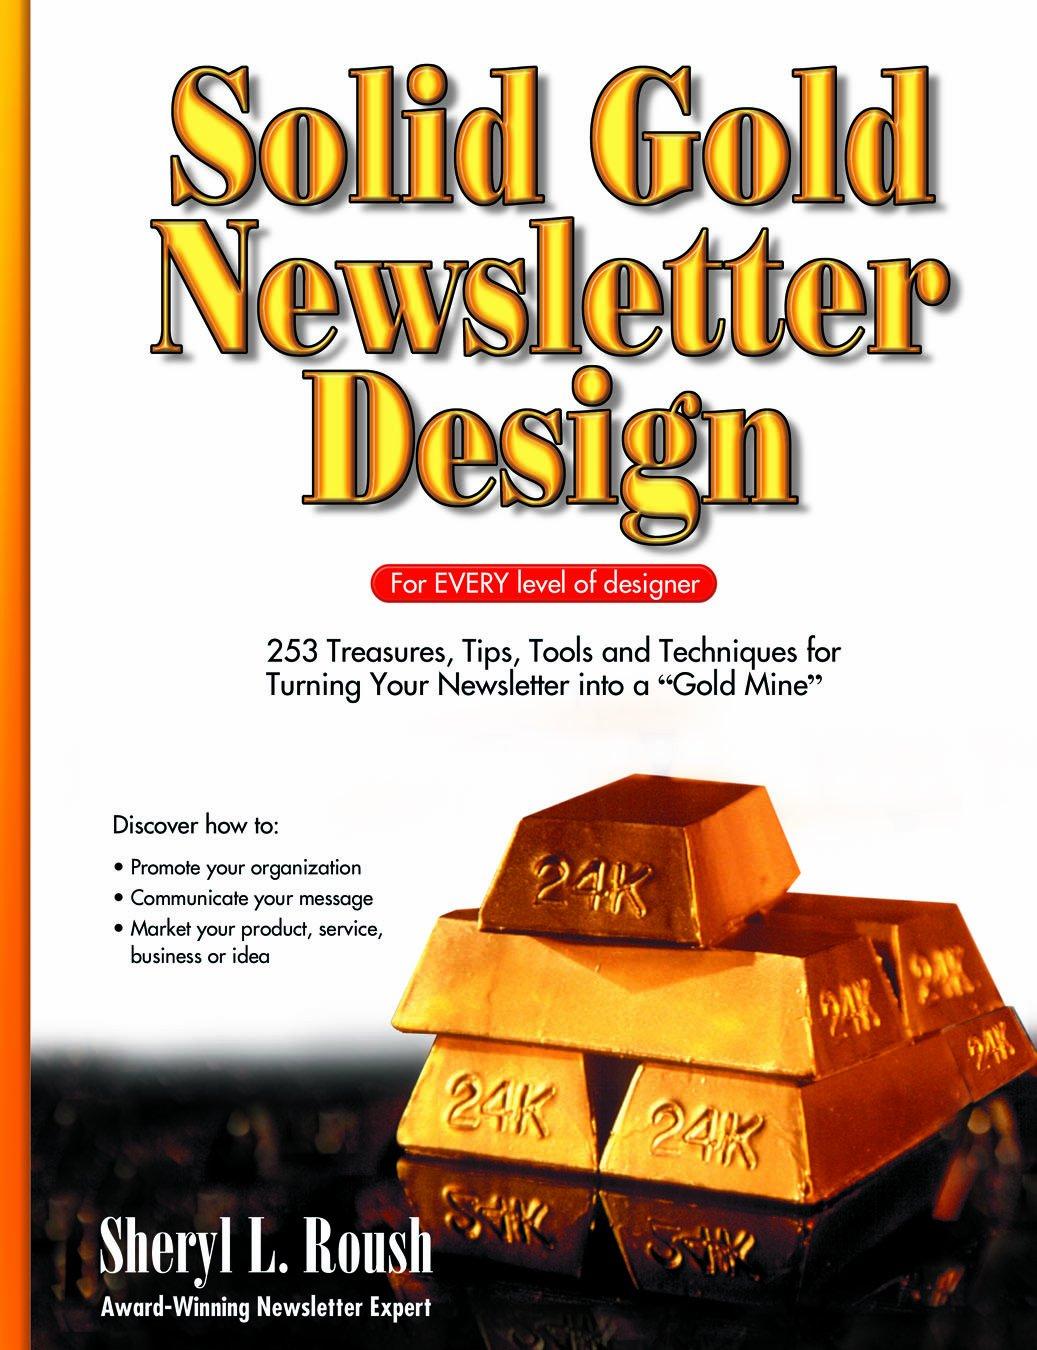 Solid Gold Newsletter Design: Amazon.es: Sheryl L. Rousa: Libros en idiomas extranjeros